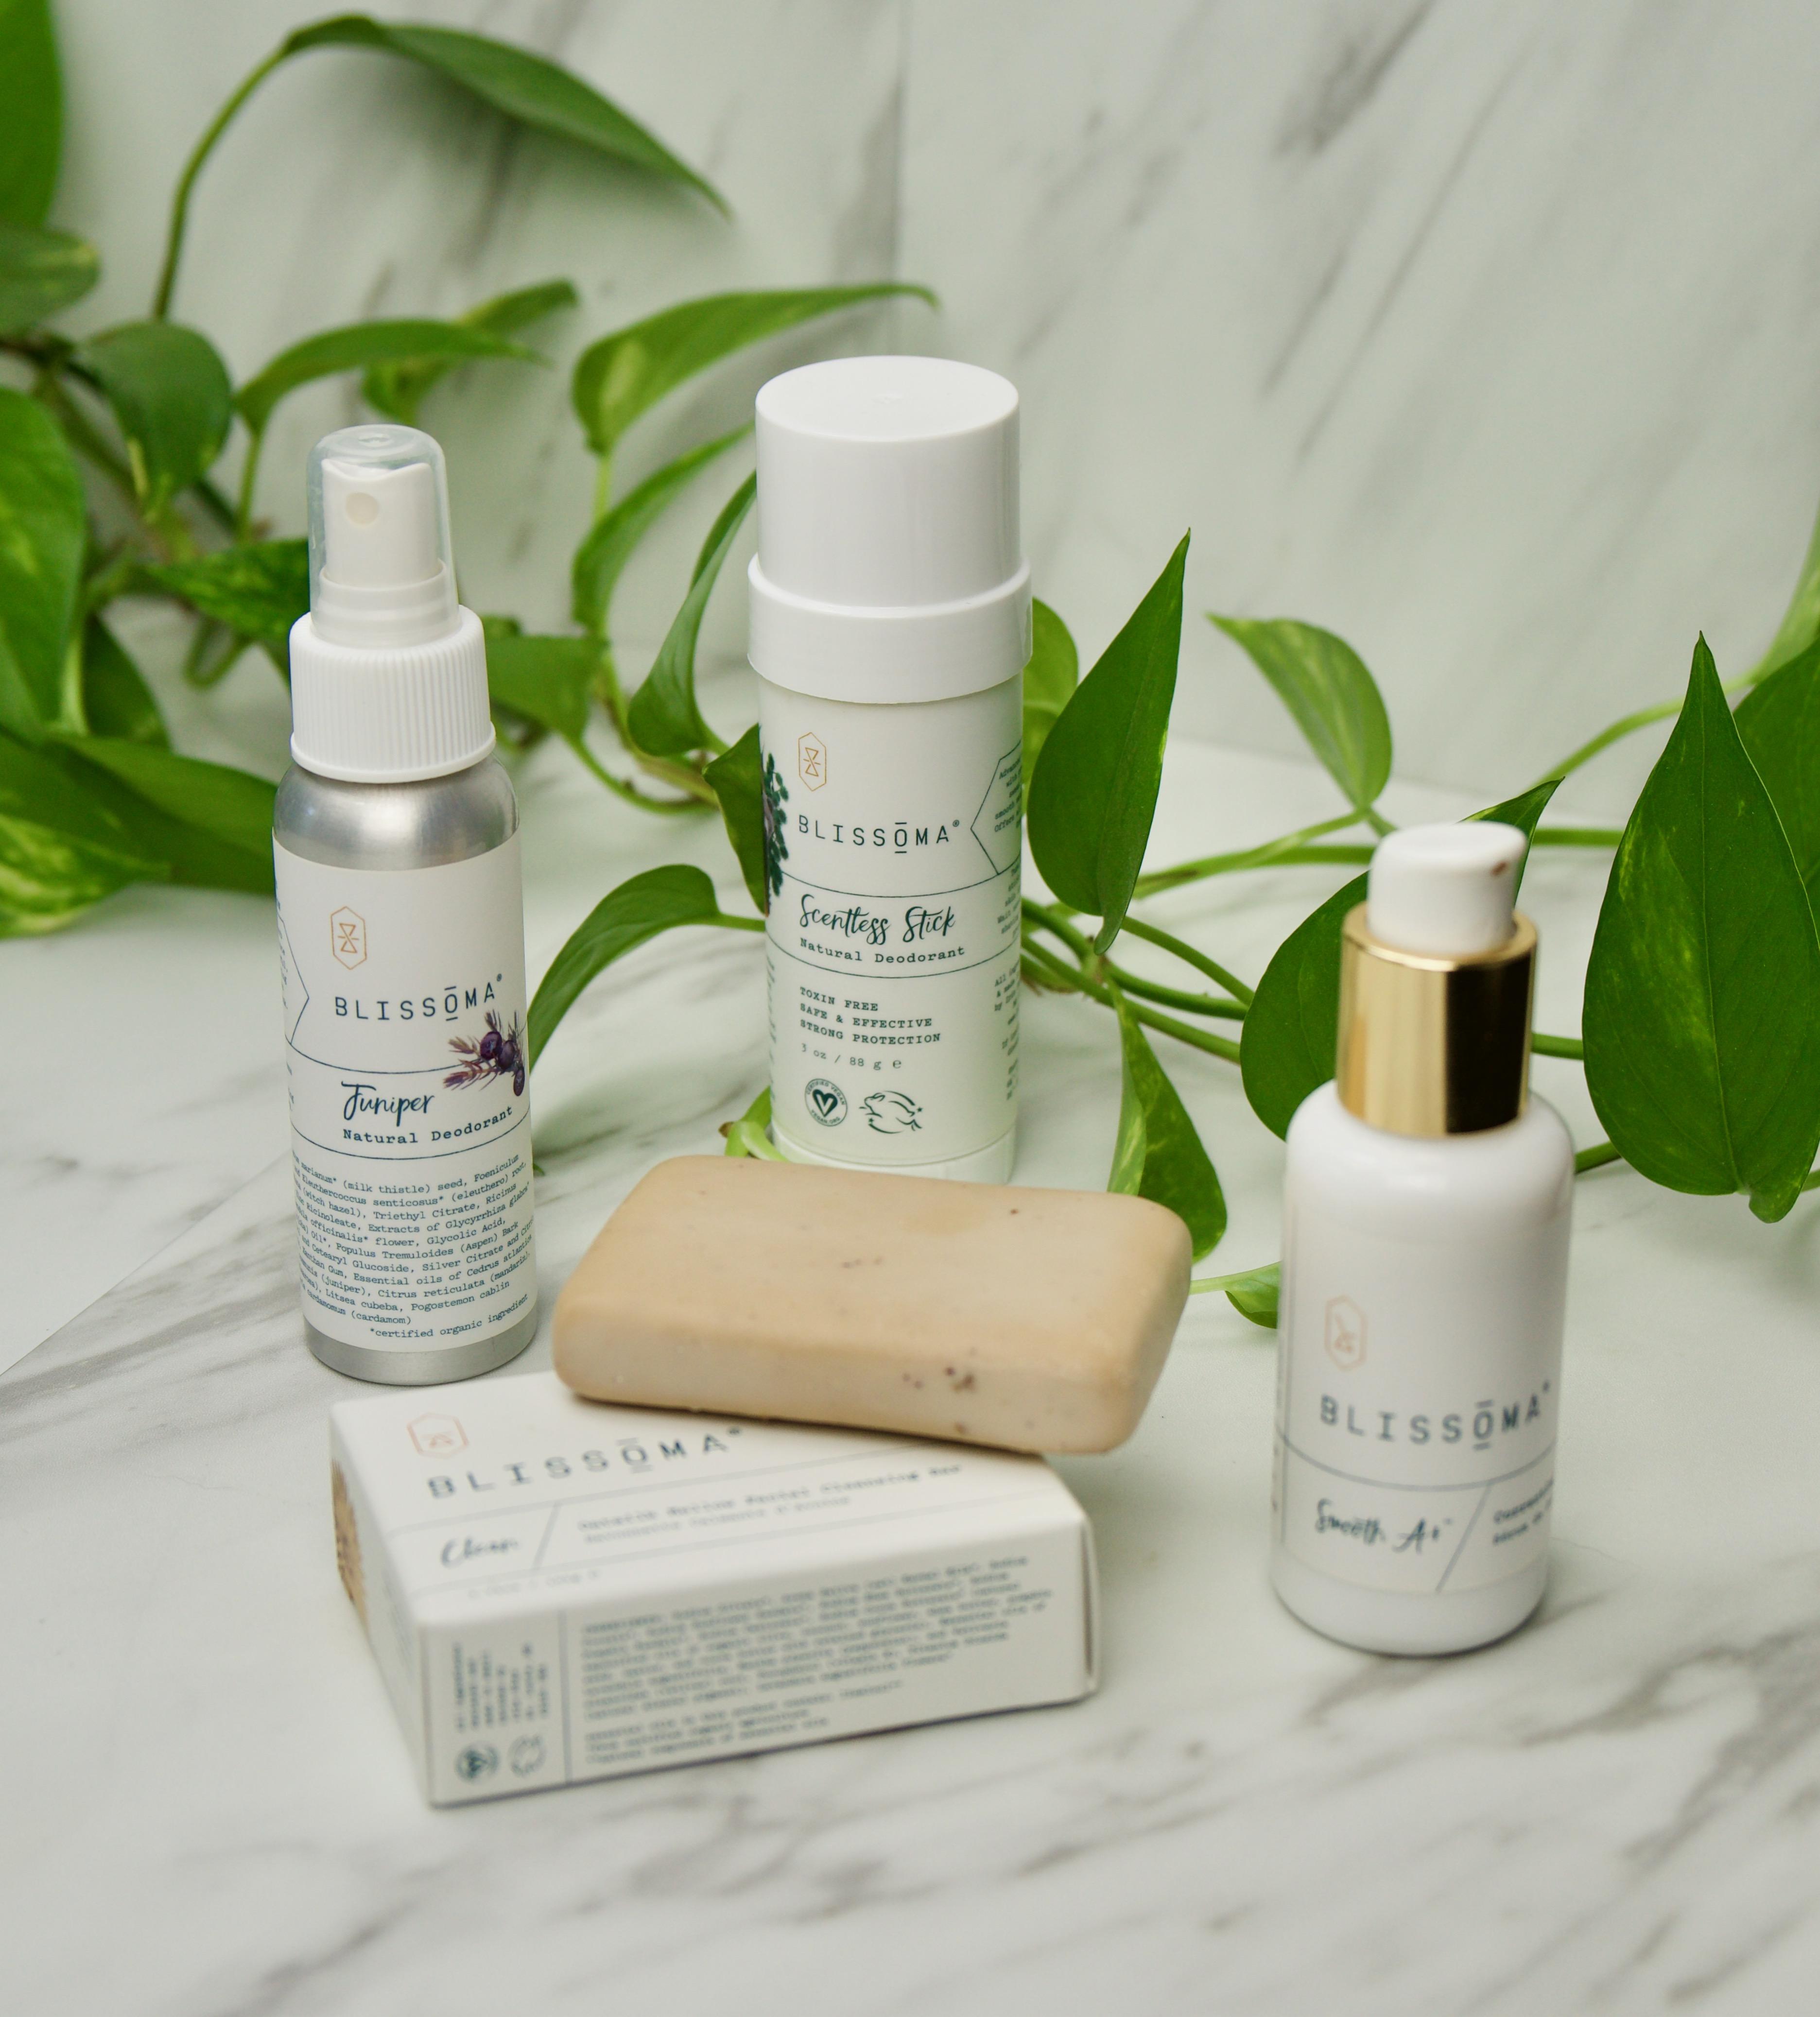 blissoma organic skincare review